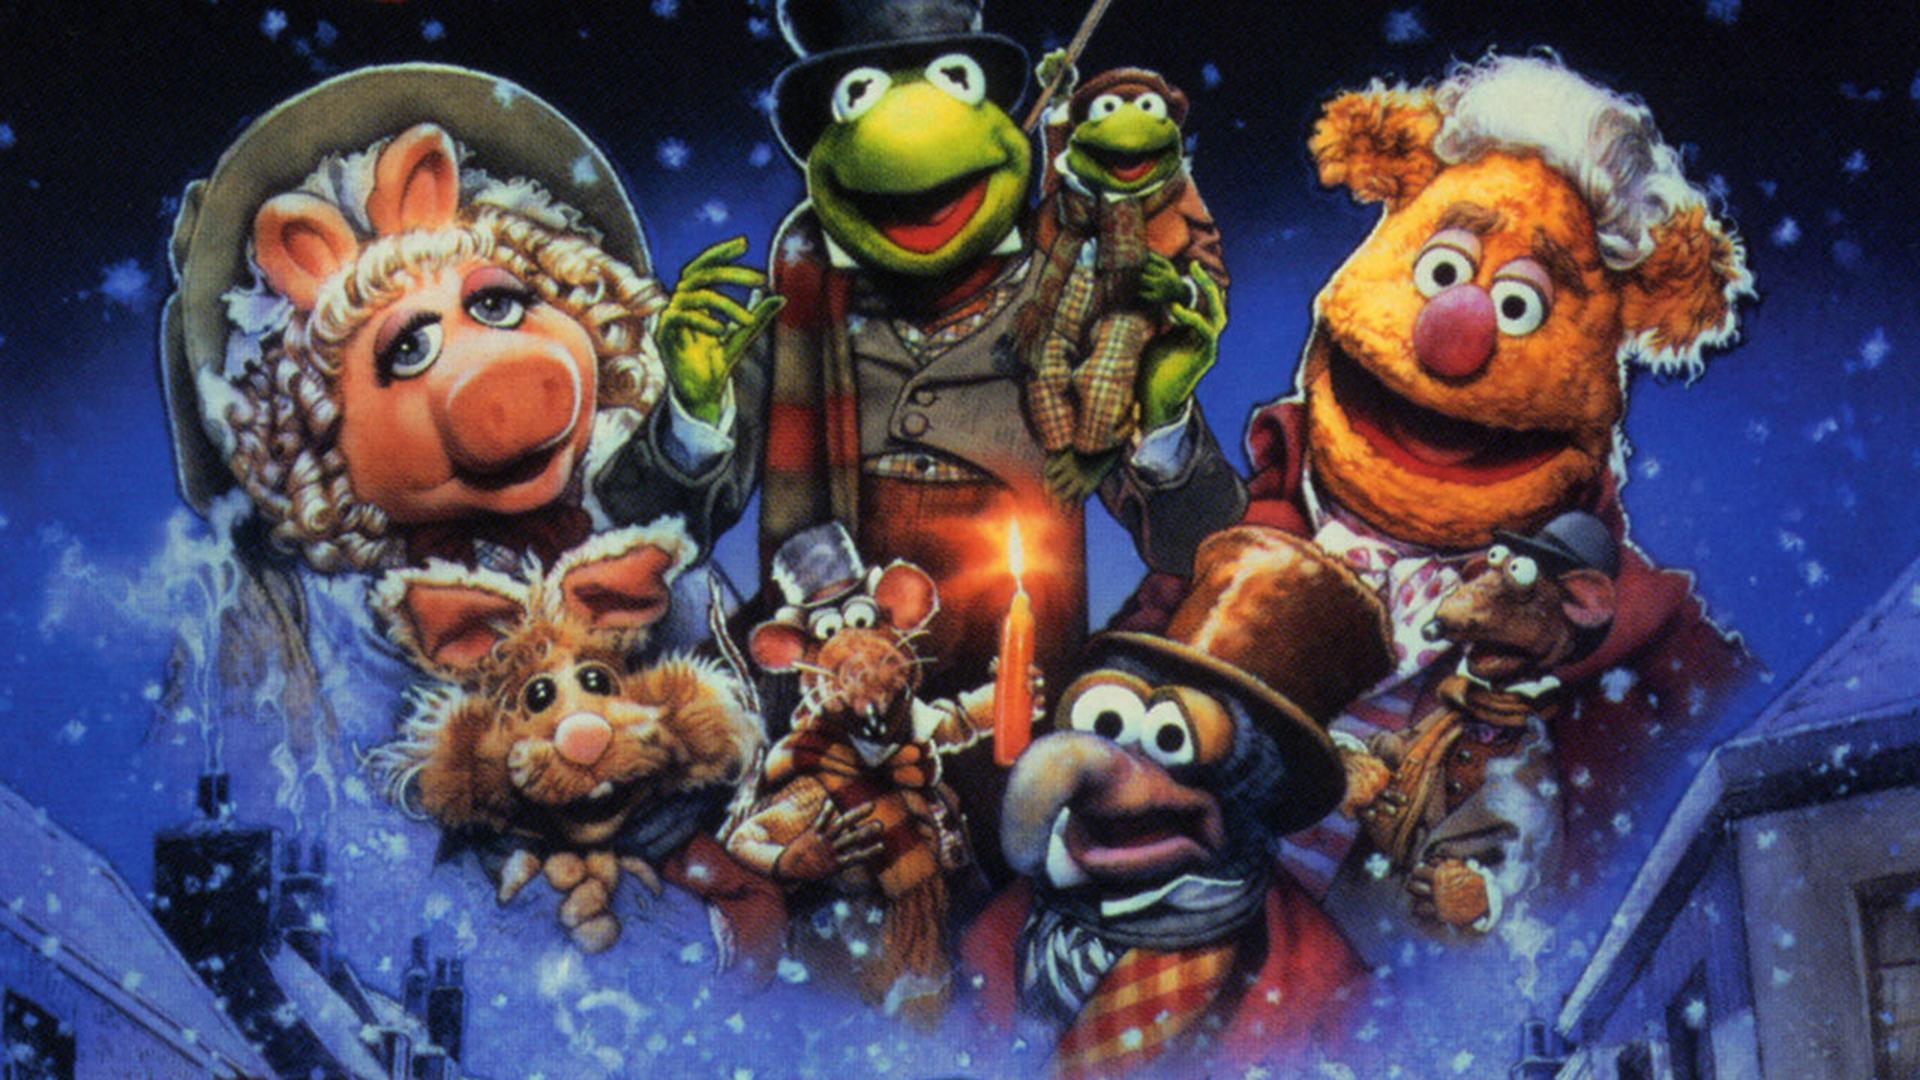 muppets christmas carol download free